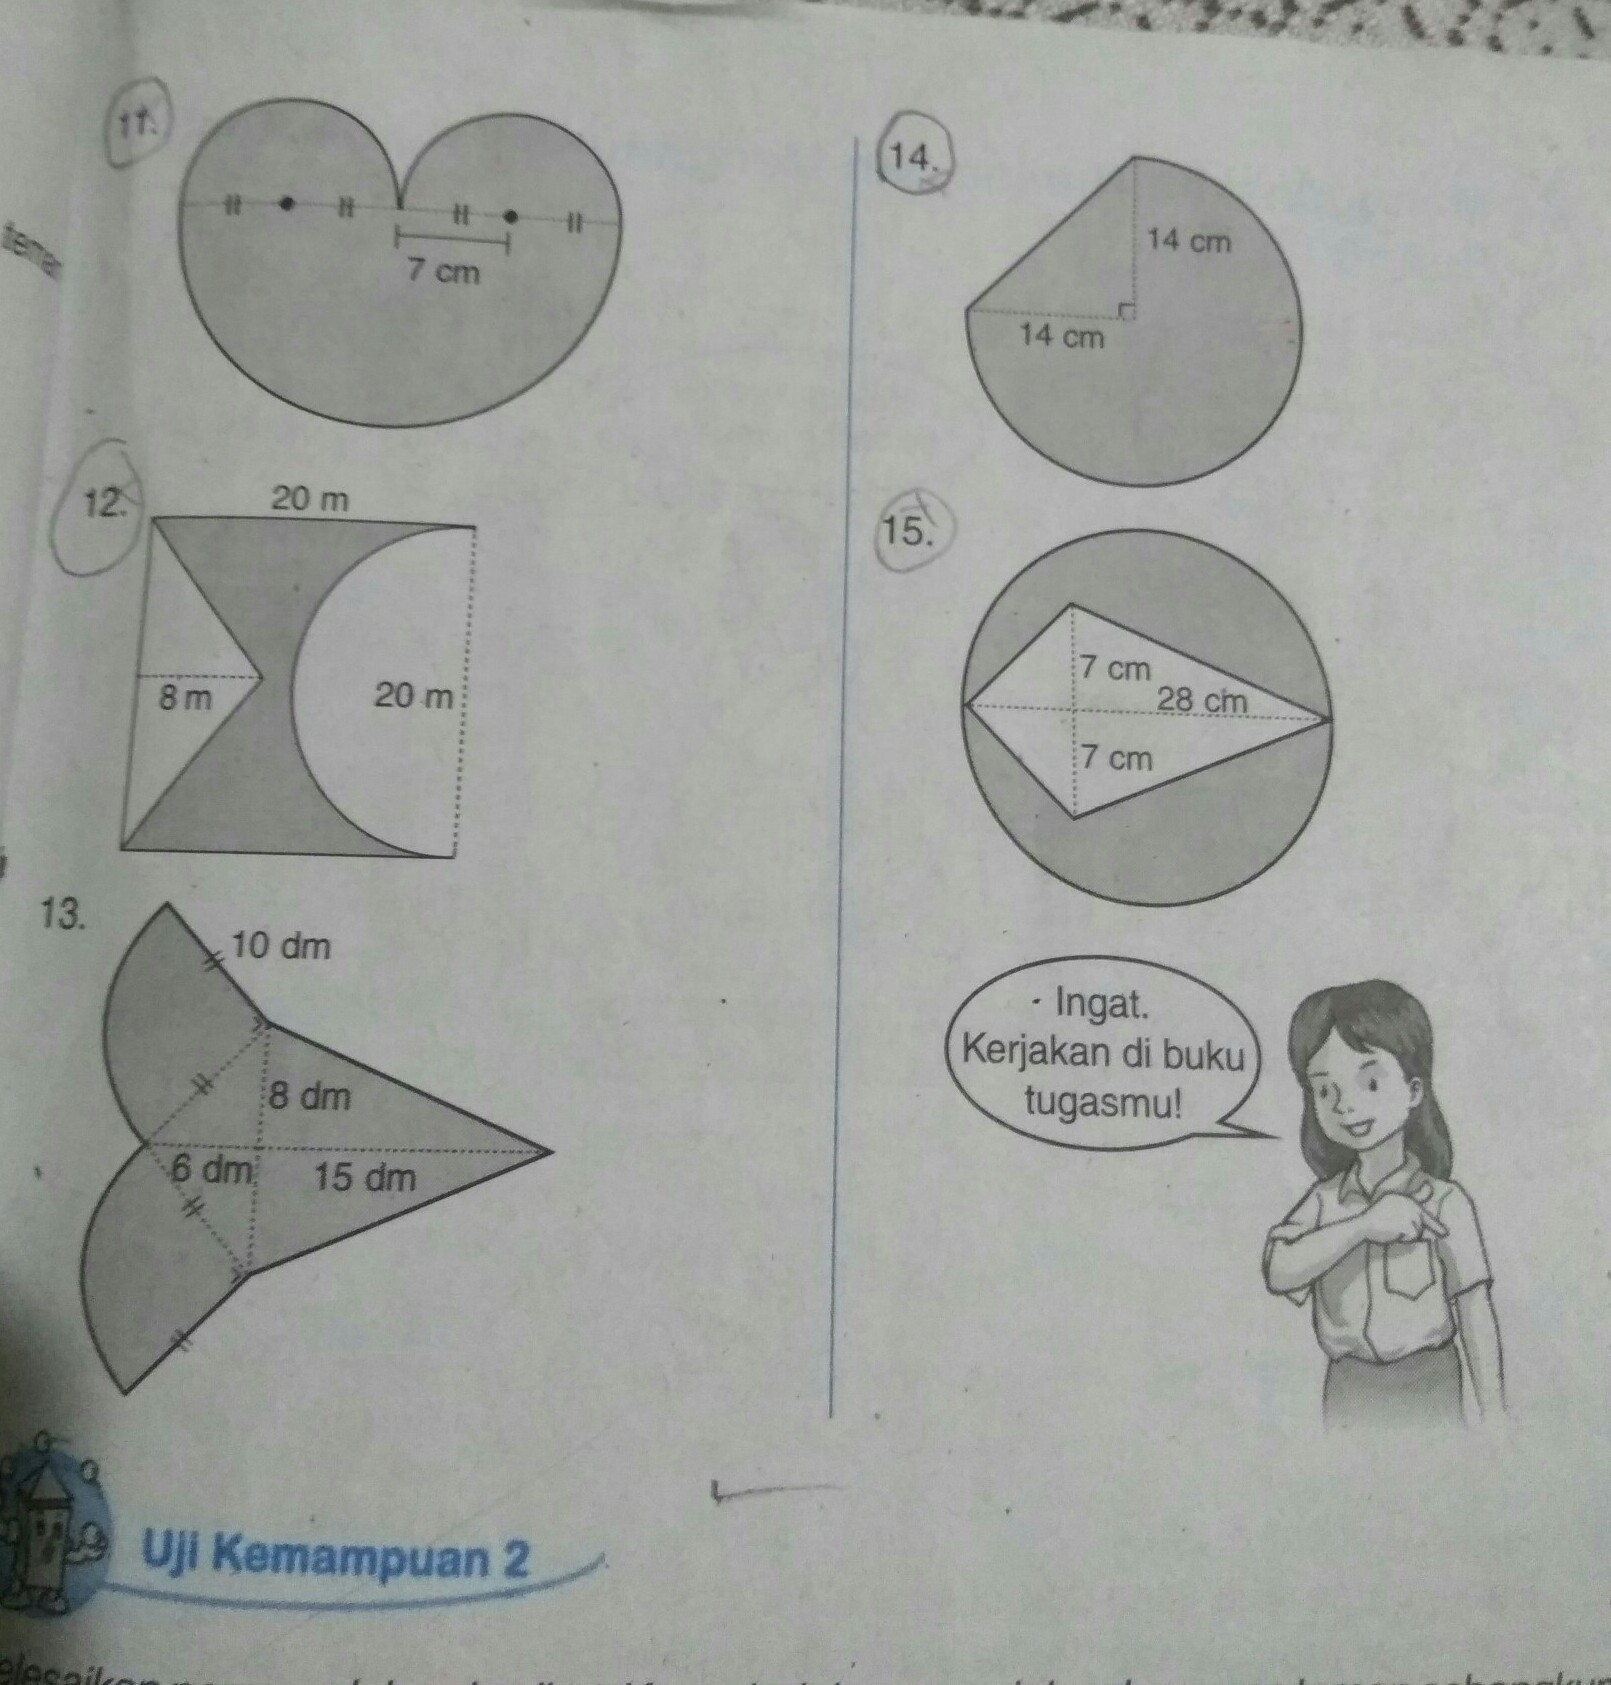 Kunci Jawaban Gemar Matematika Kelas 6 Hal 57 Sanjau Soal Latihan Anak